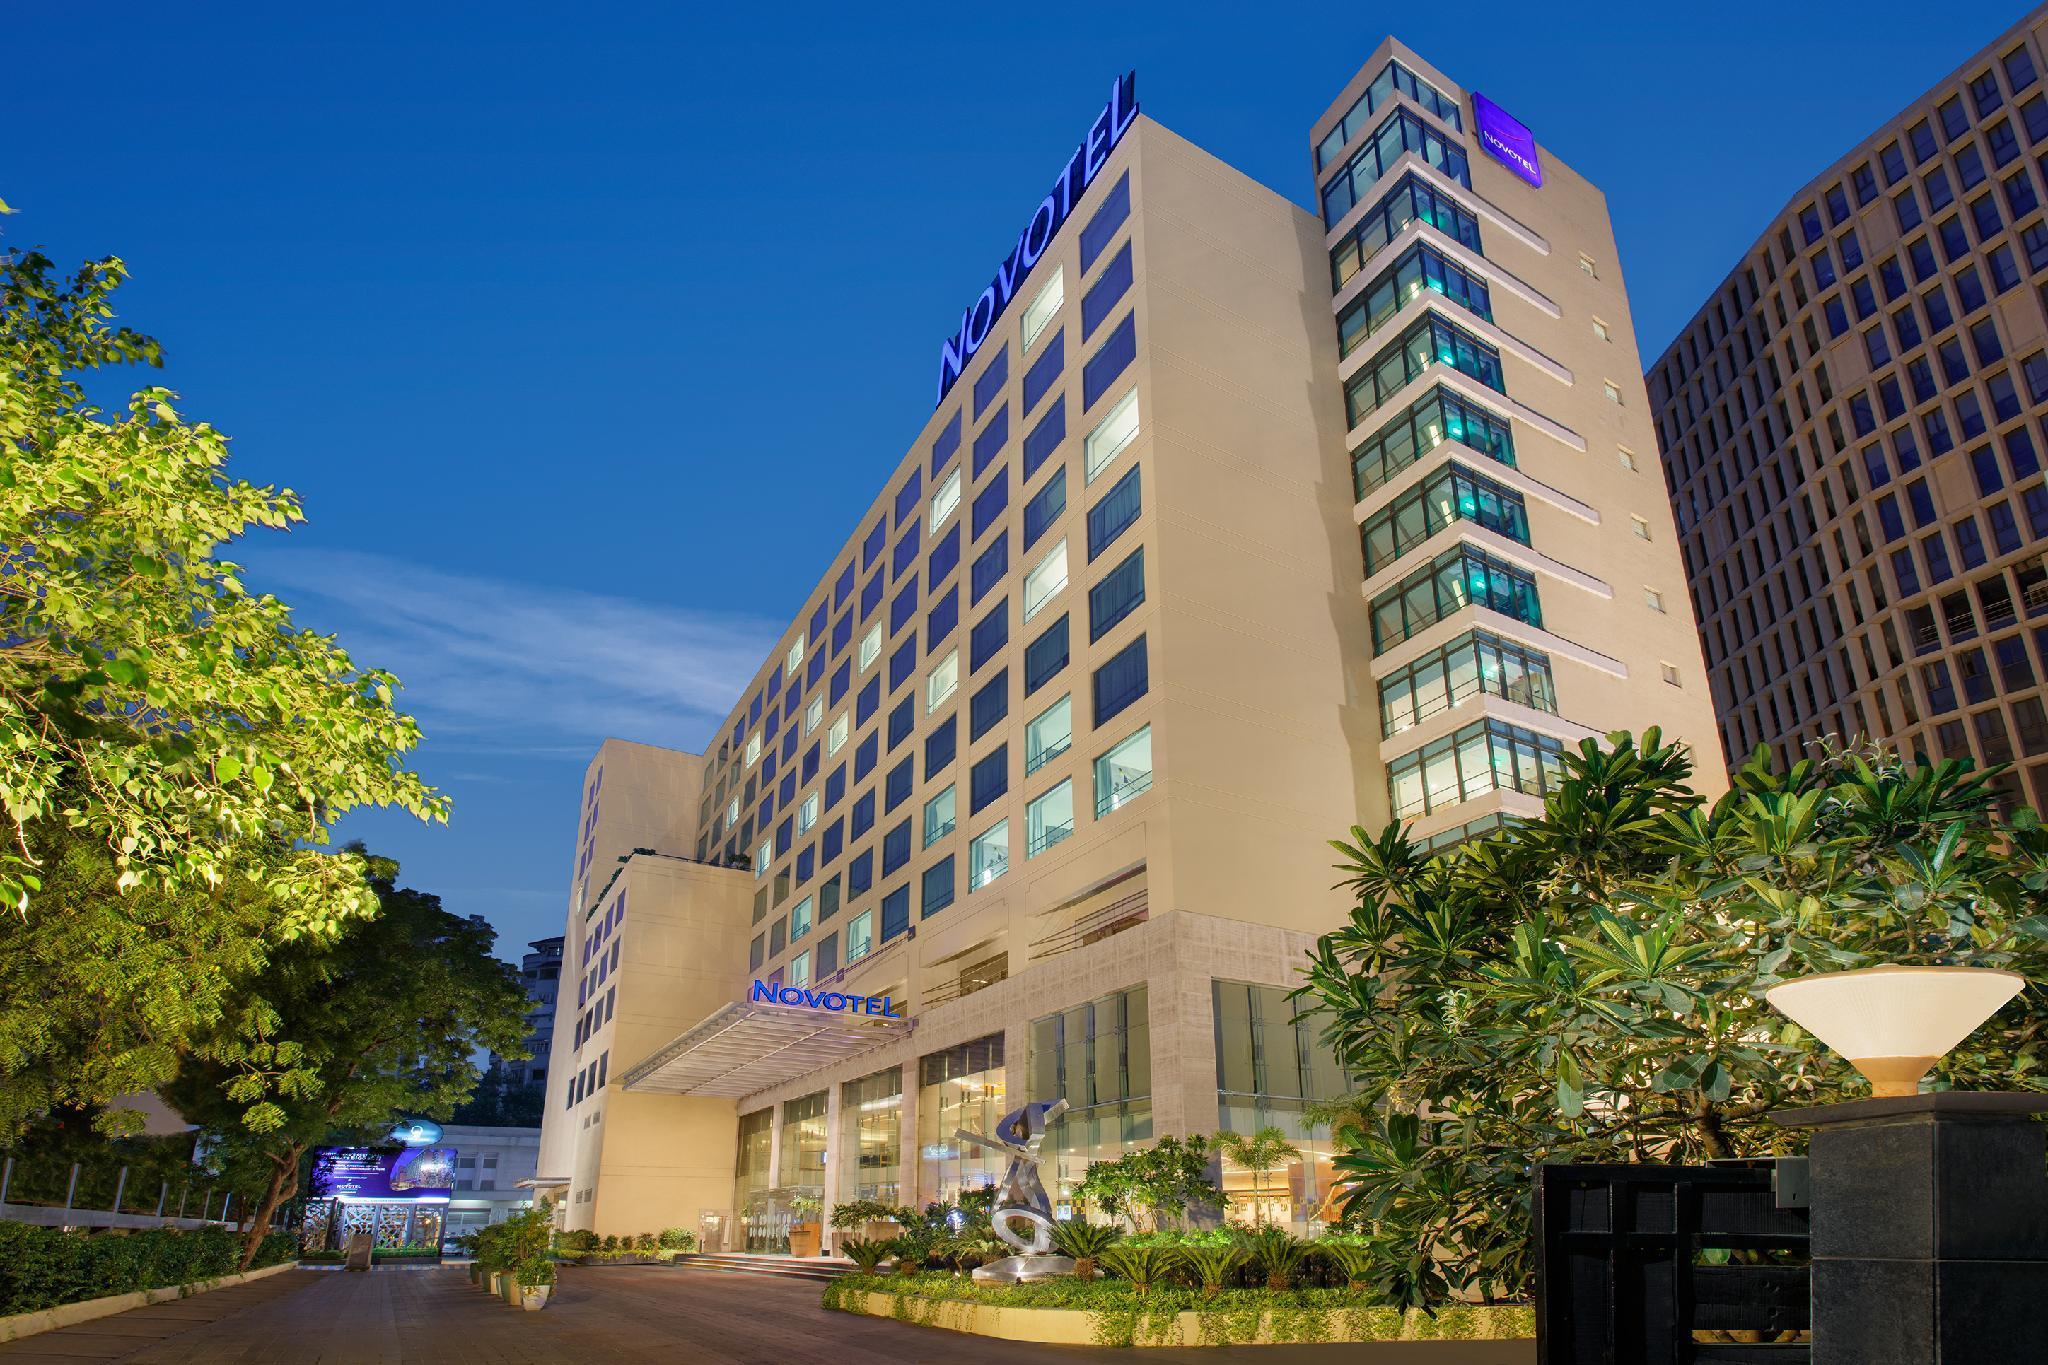 Novotel Ahmedabad Hotel   An AccorHotels Brand